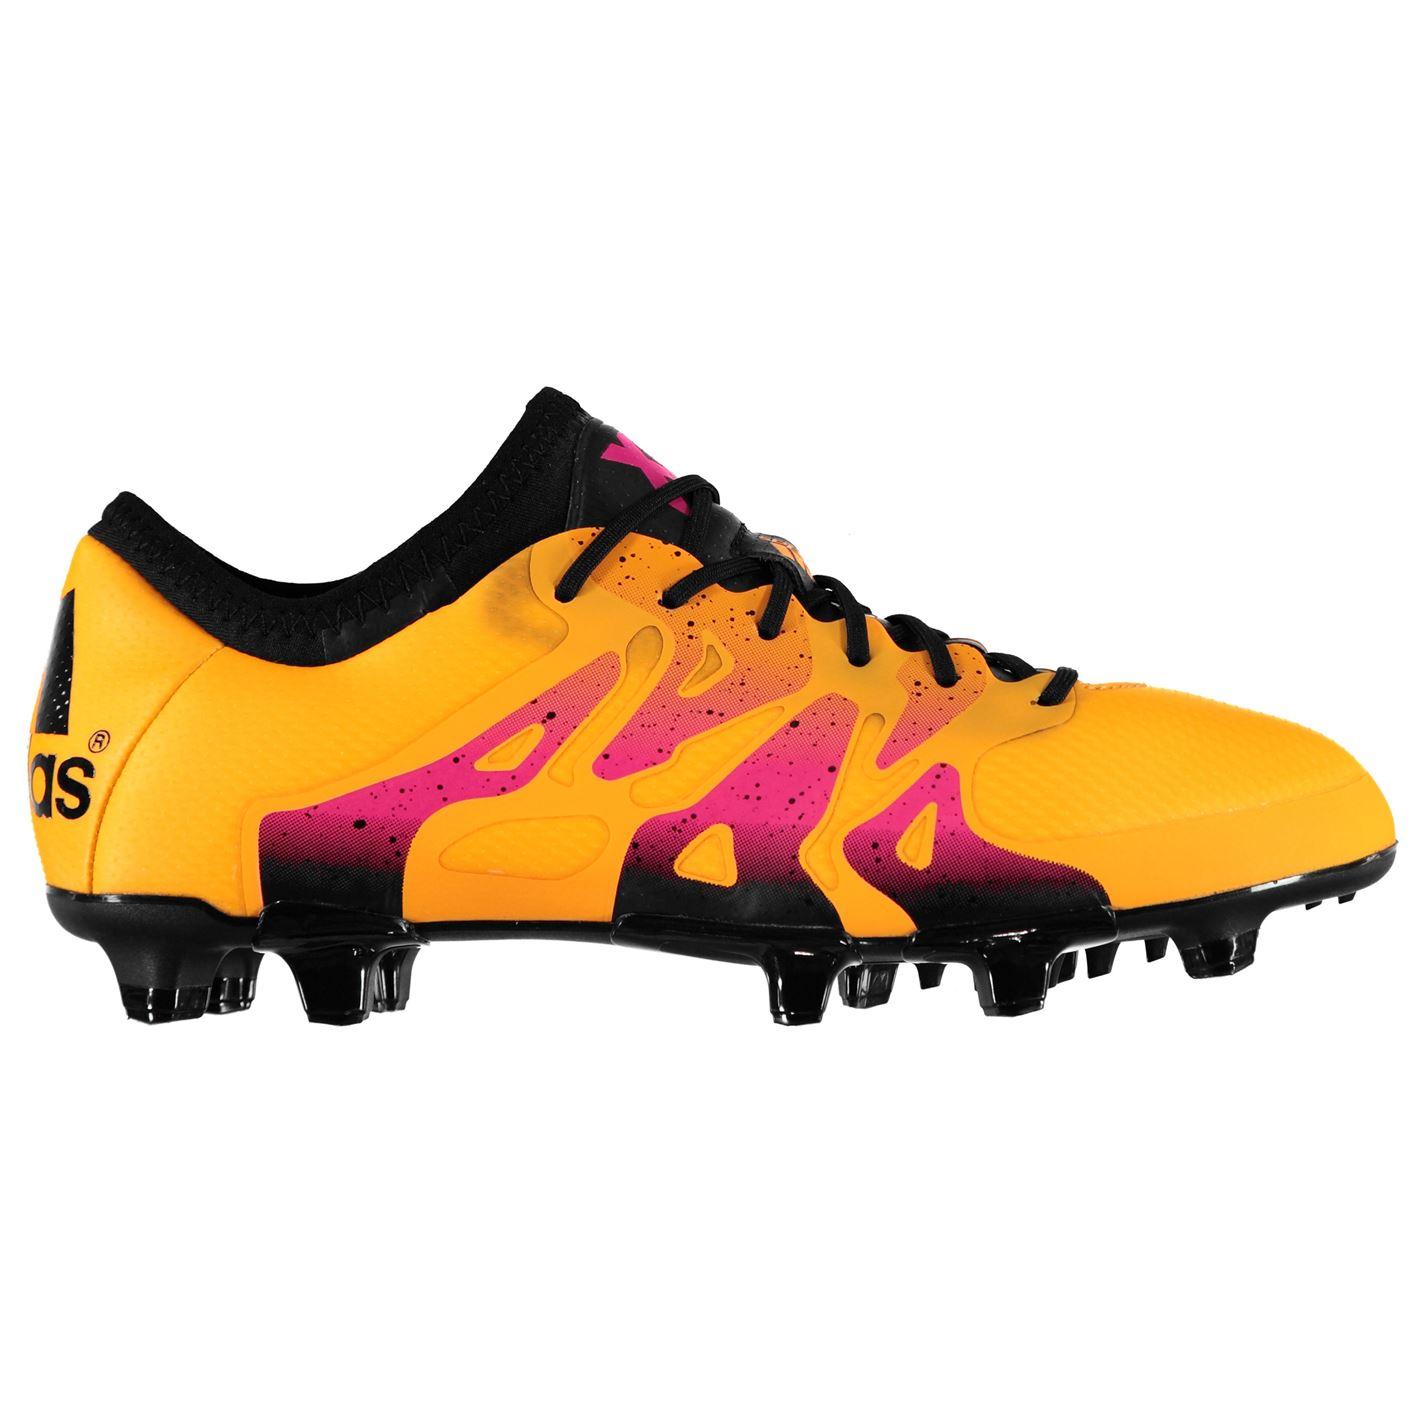 Adidas X 15.1 FG AG Solar Gold Mens Football Boots